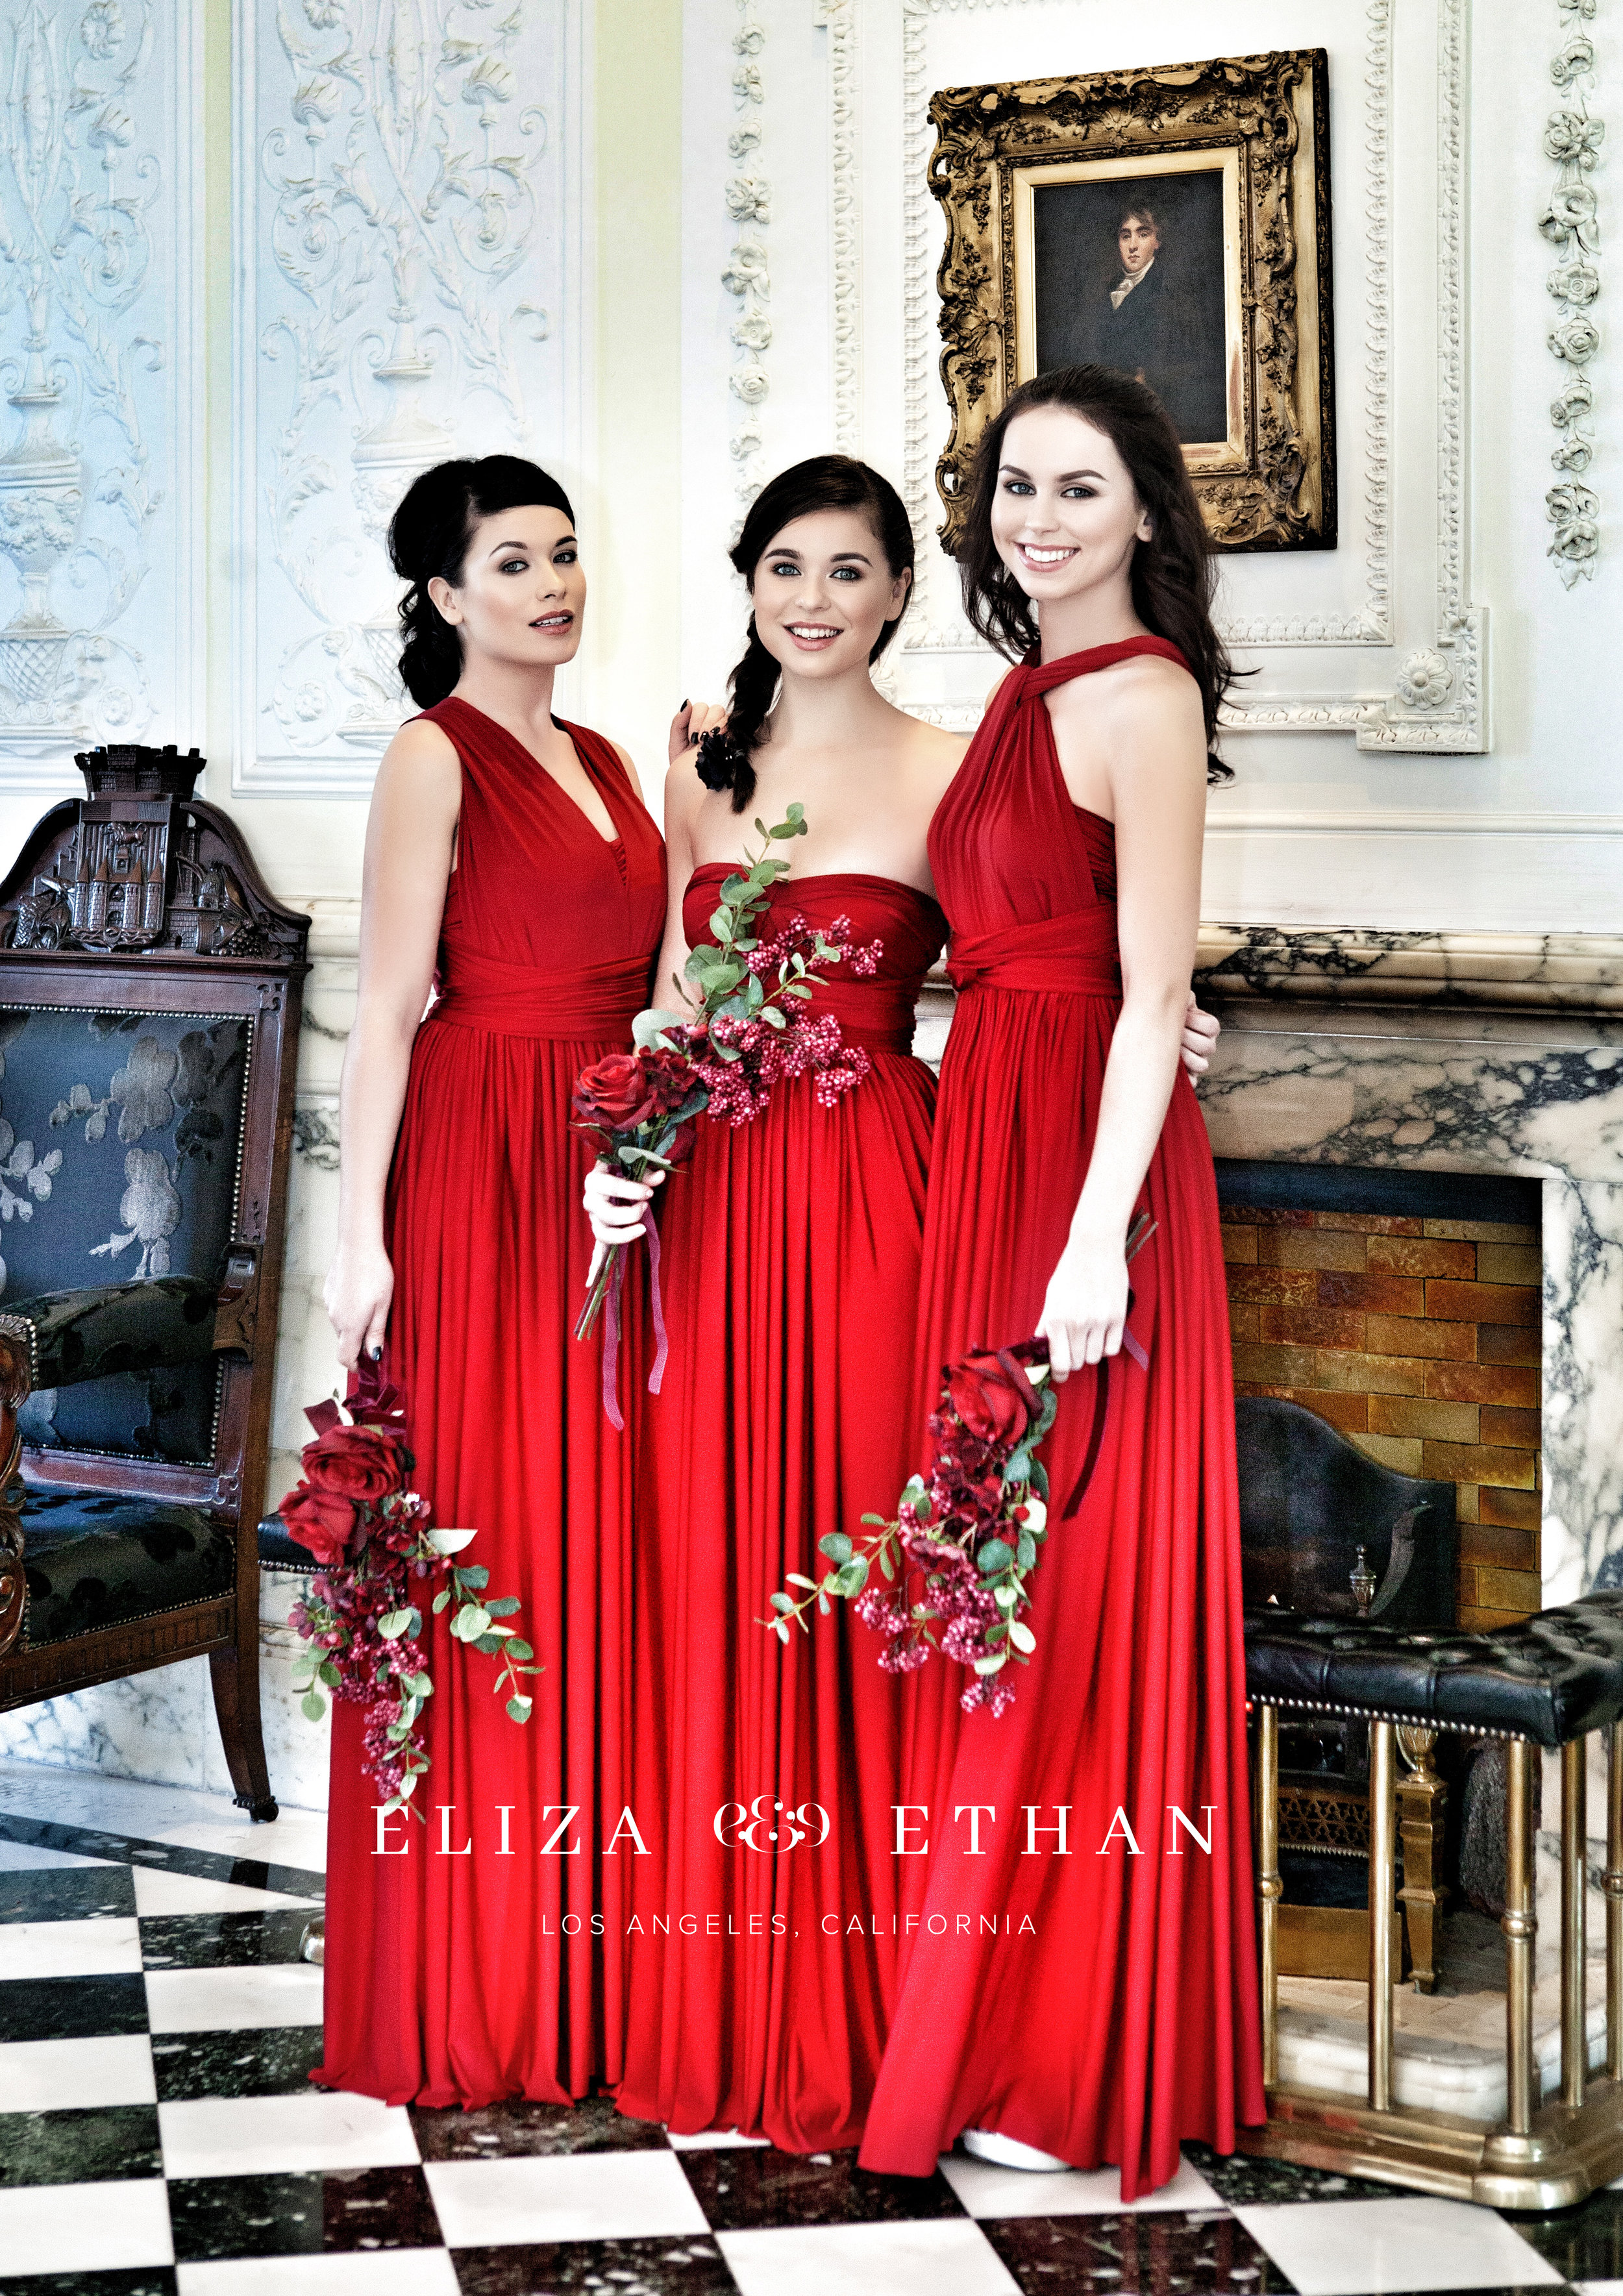 Eliza & Ethan multi way wrap dress red bridesmaids dress wedding